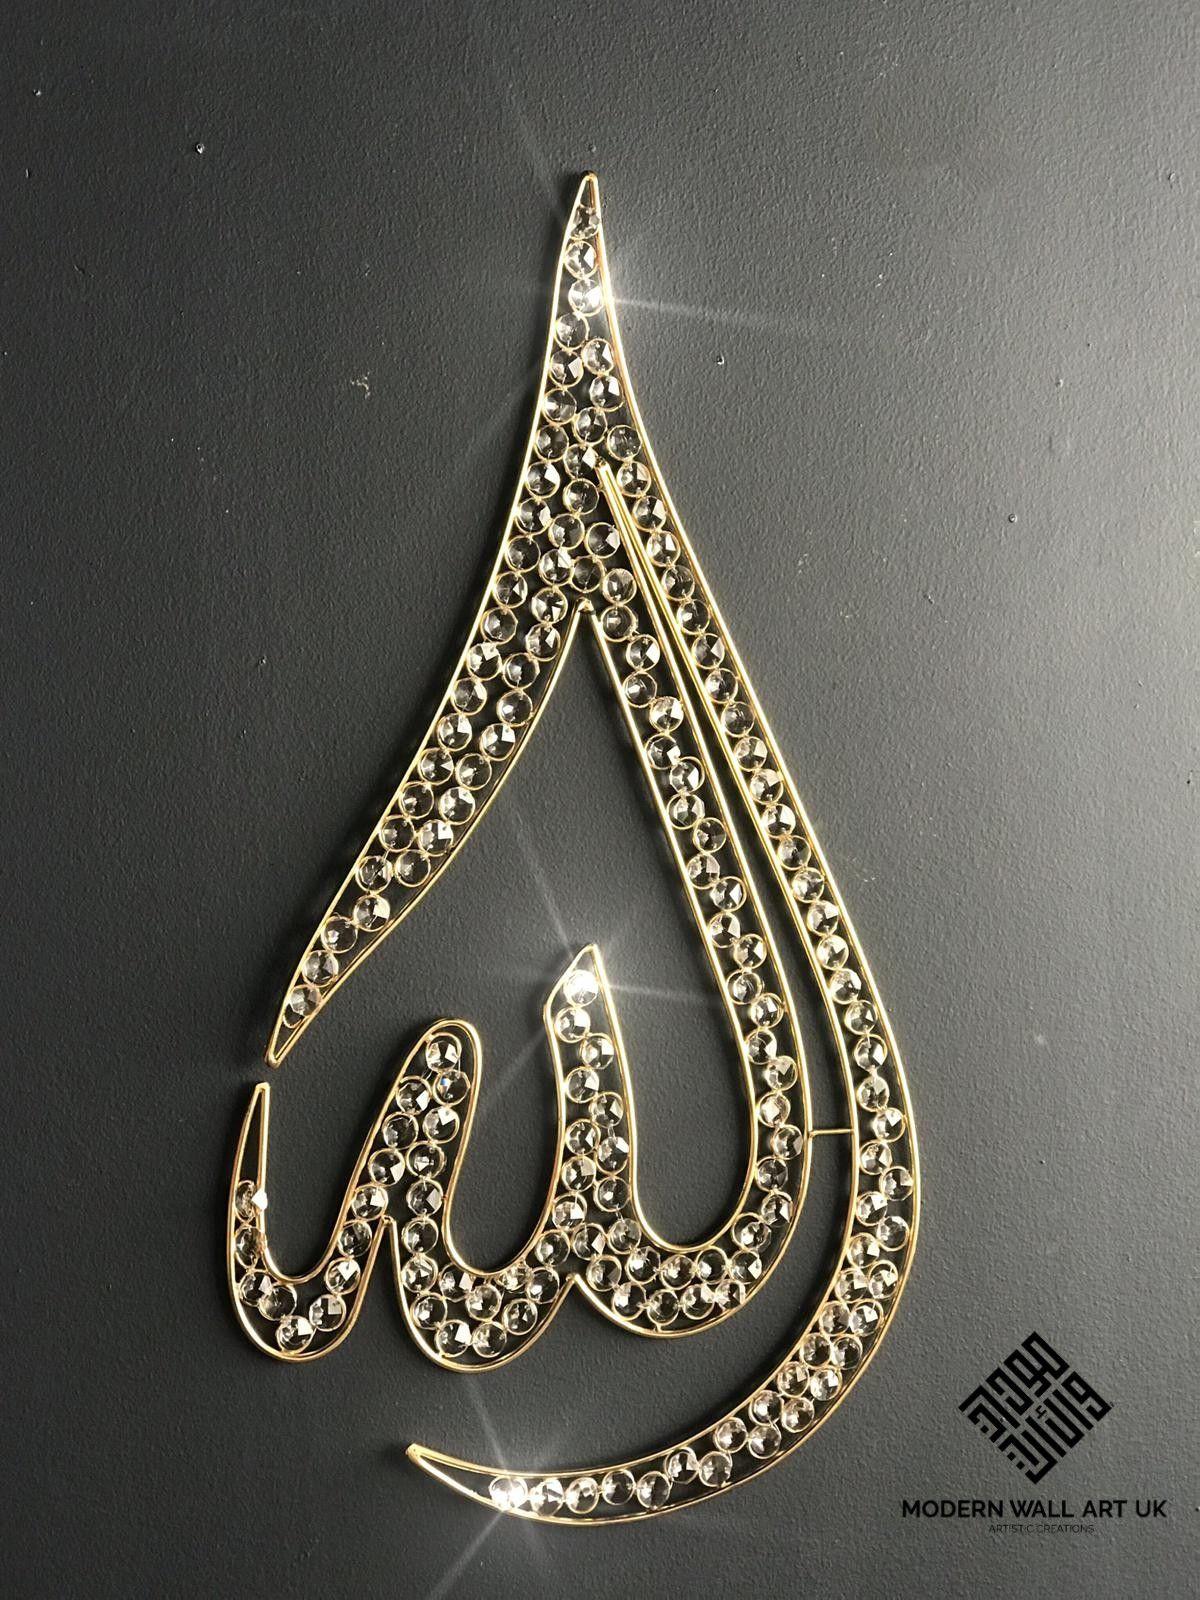 Modern Wall Art UK - Allah Teardrop Metal Wire with ...